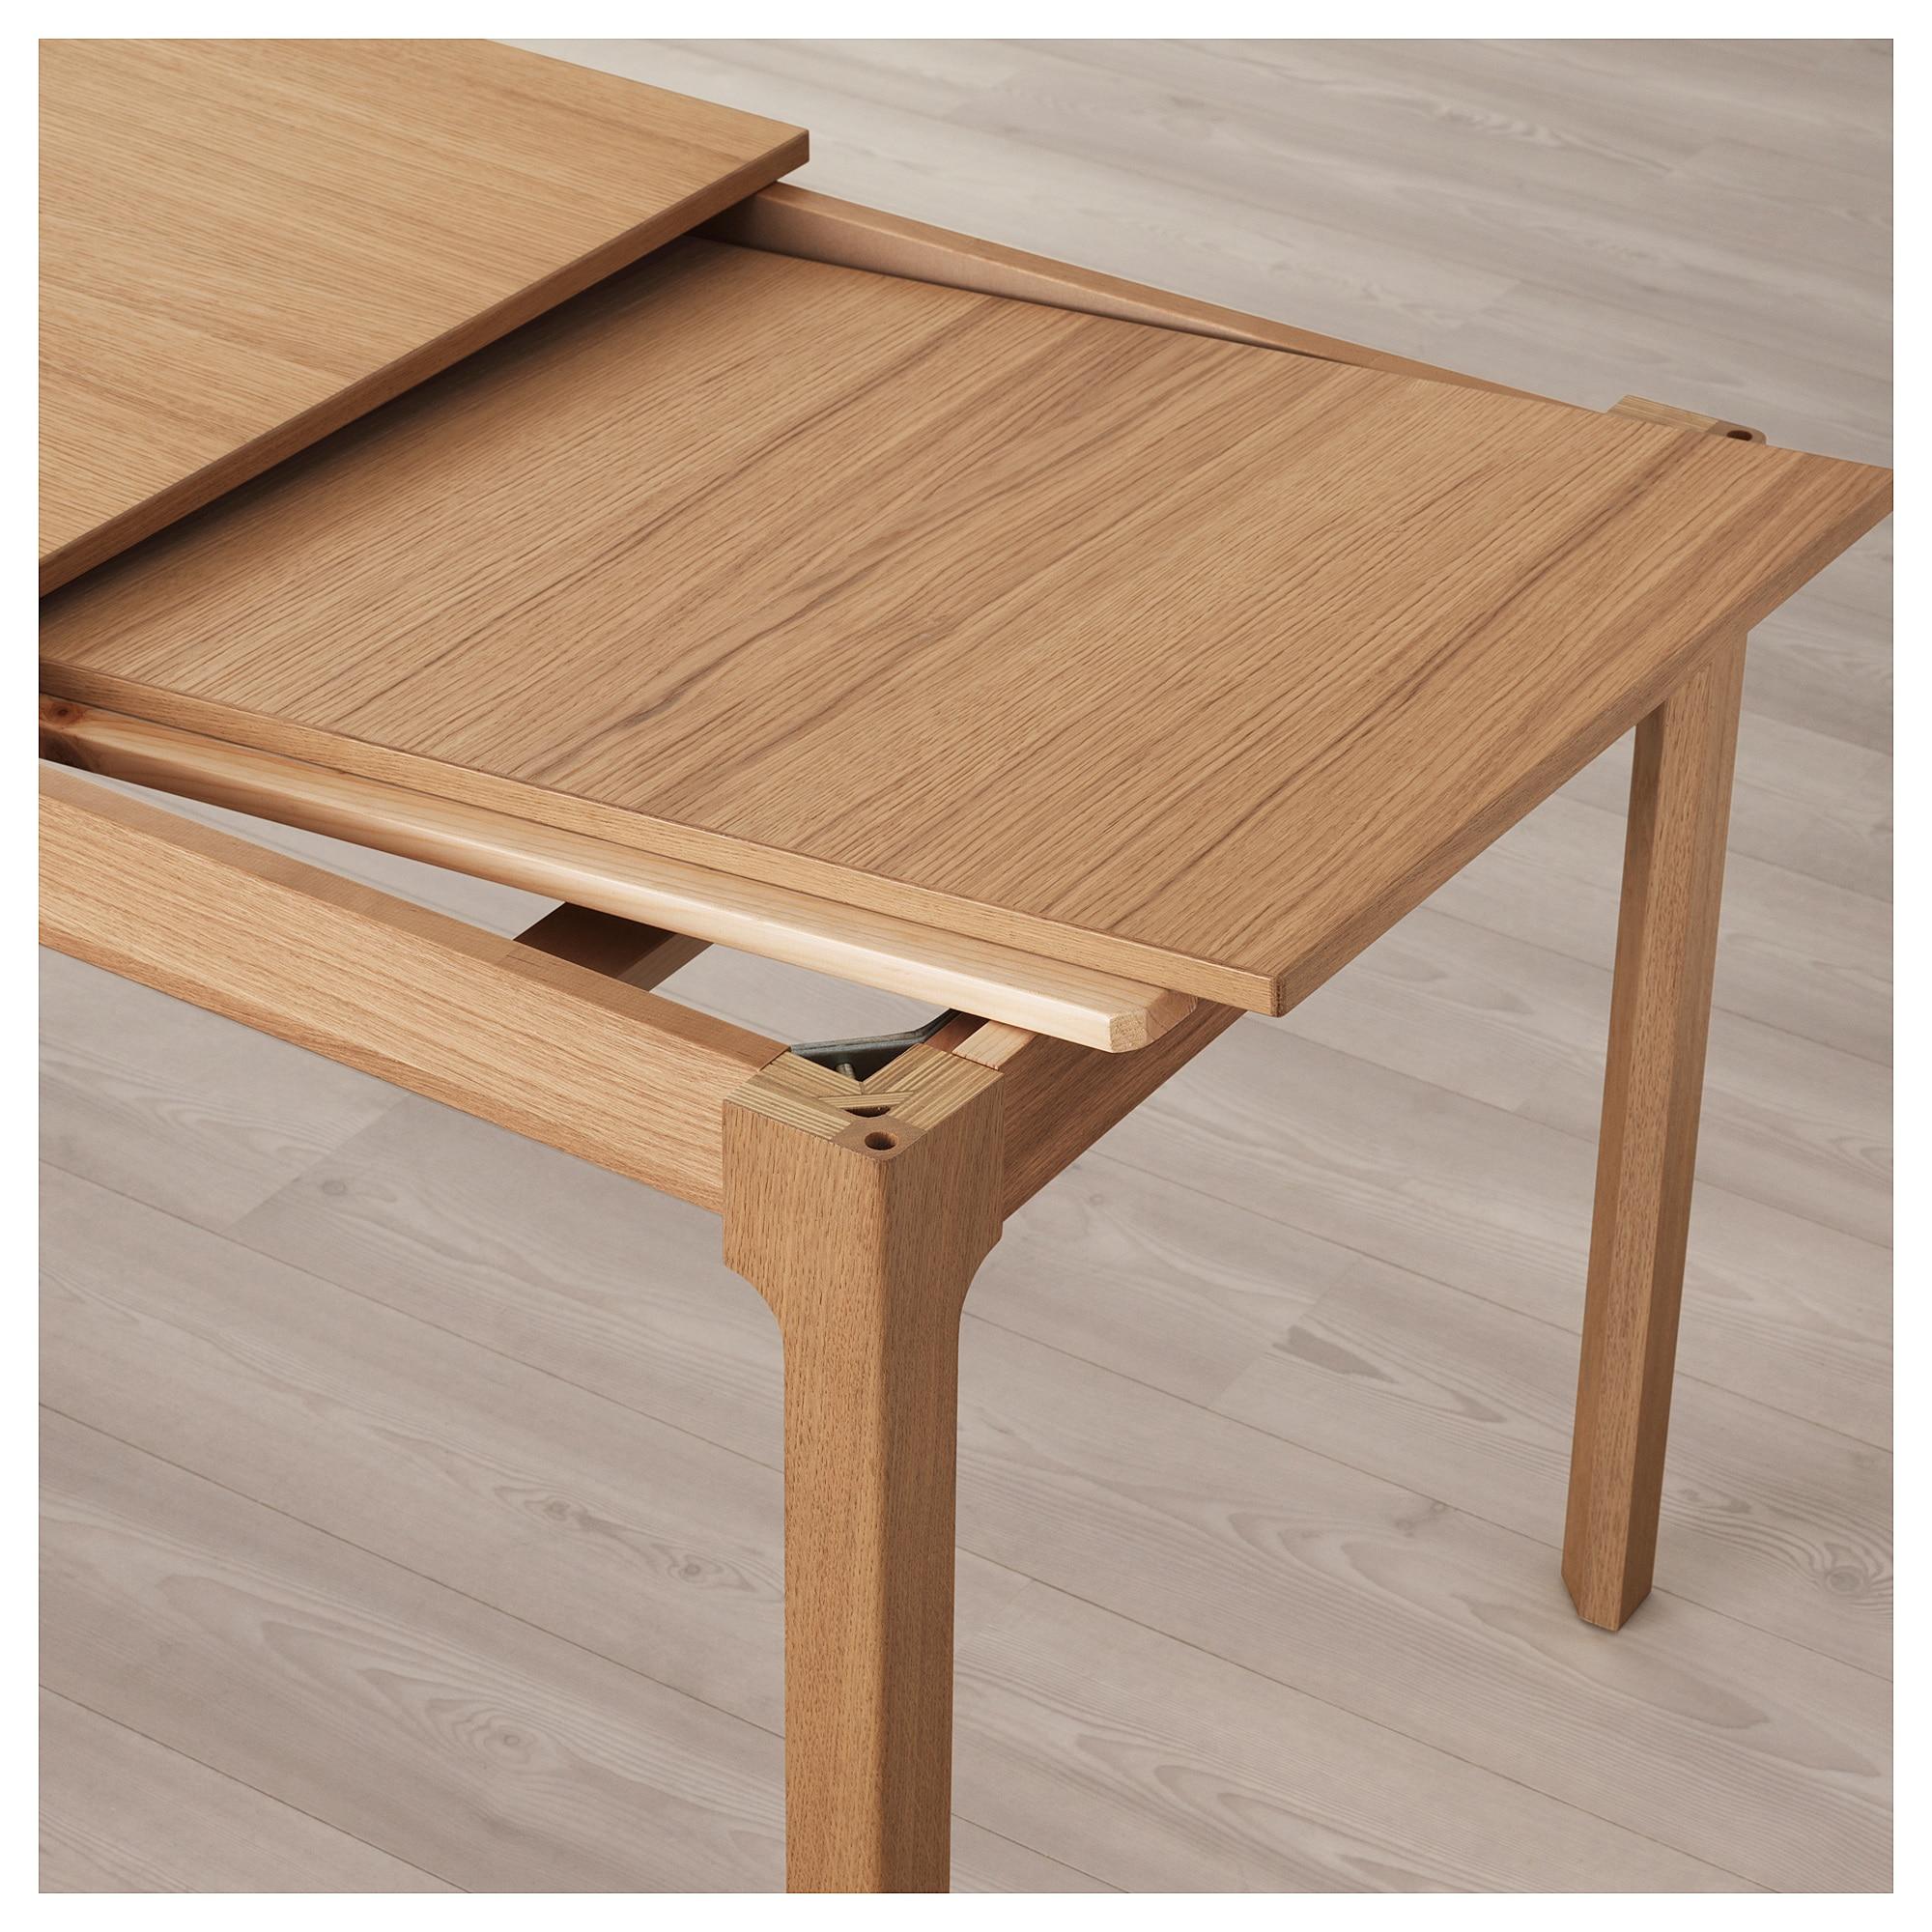 Table Carree Extensible Ikea.Ekedalen Extendable Table Oak Ikea Ikea Extendable Table